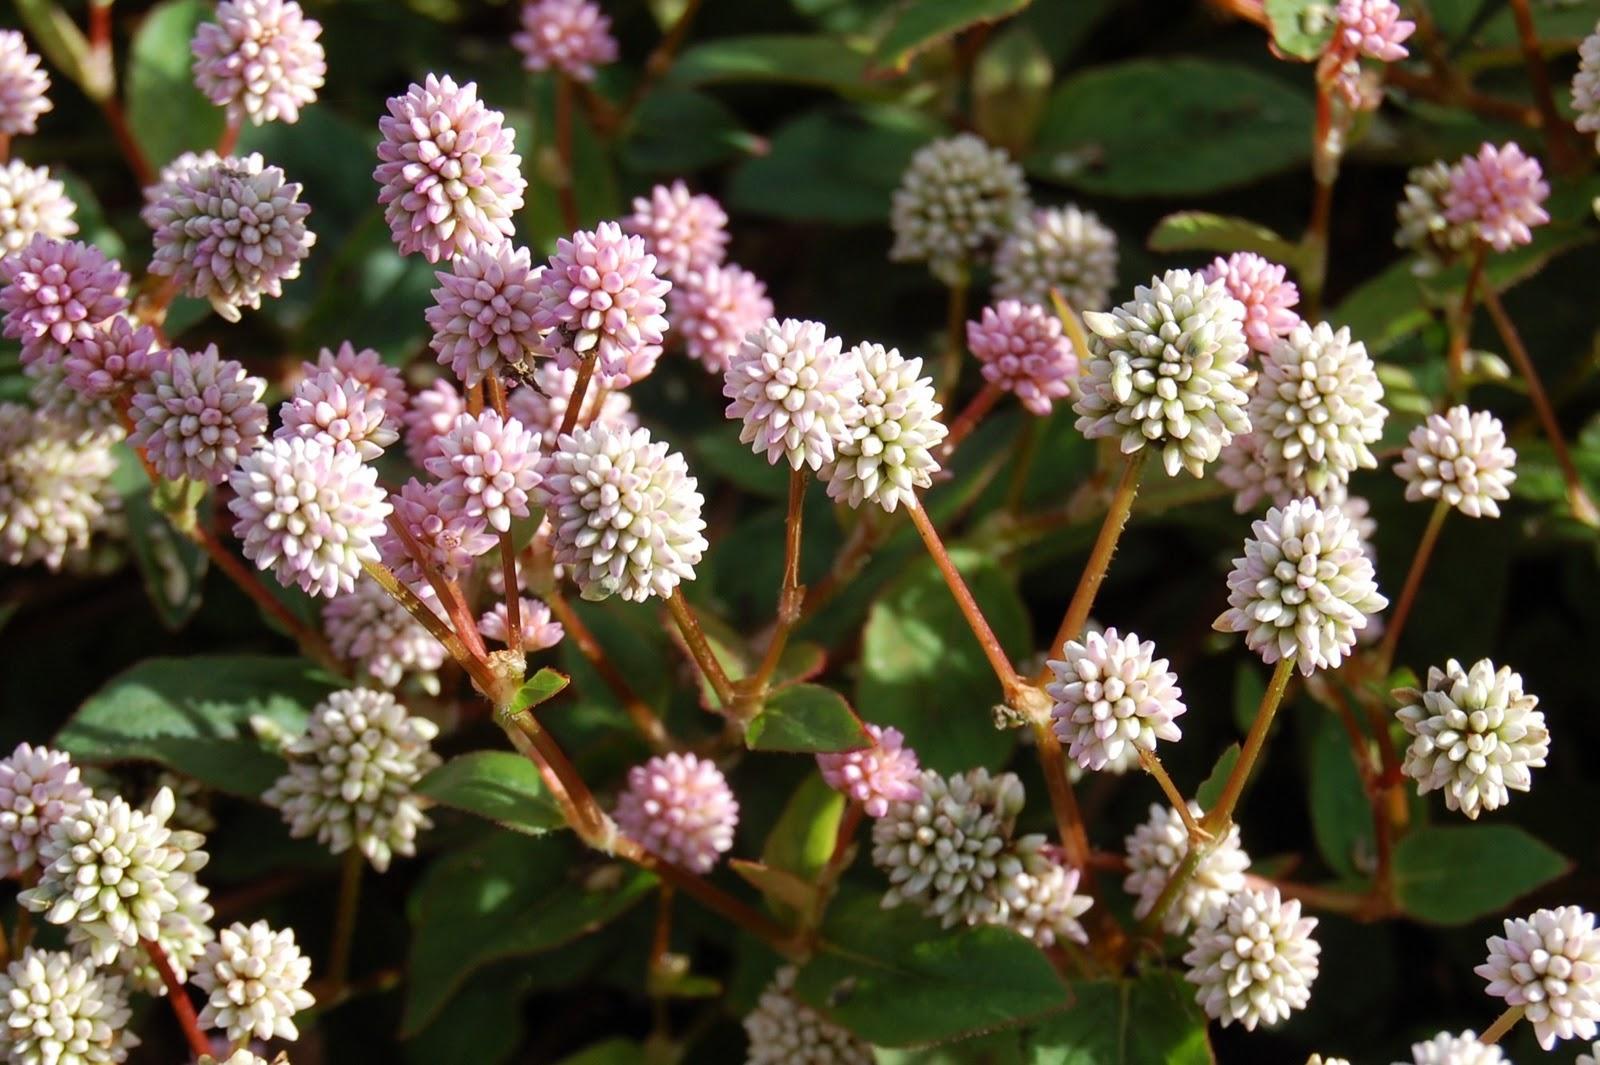 Plantas Beleza e Diversidade Polígonodejardim (Polygonum